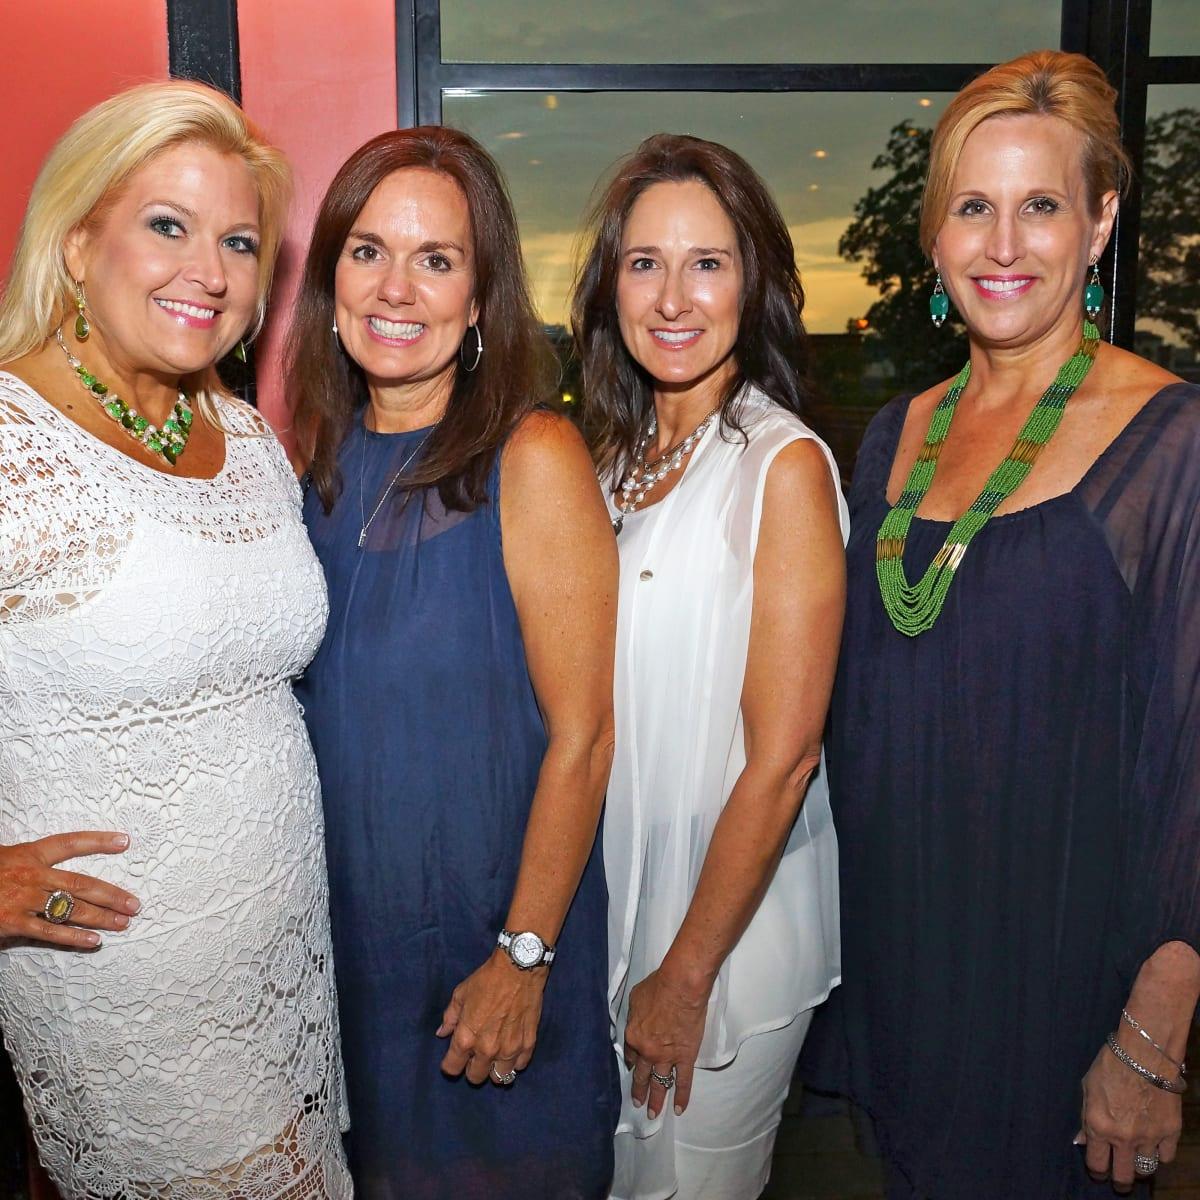 Houston, Roseann Rogers and Lara Bell birthday party, August 2015, Michelle Maresh, Angela Poujol, Lisa Erwin and Vanessa Sendukas